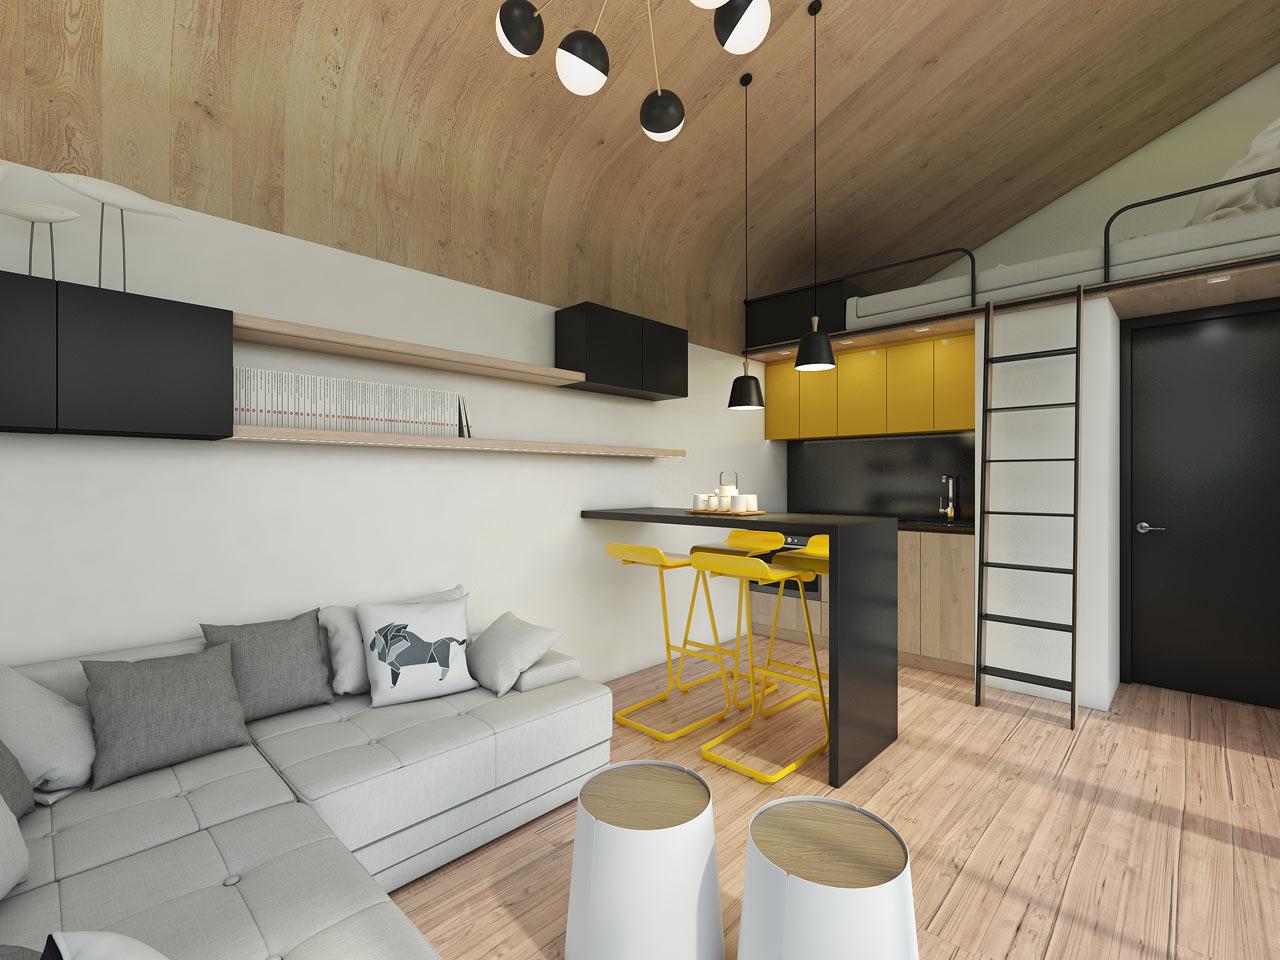 koncept-kompaktnogo-portativnogo-doma1